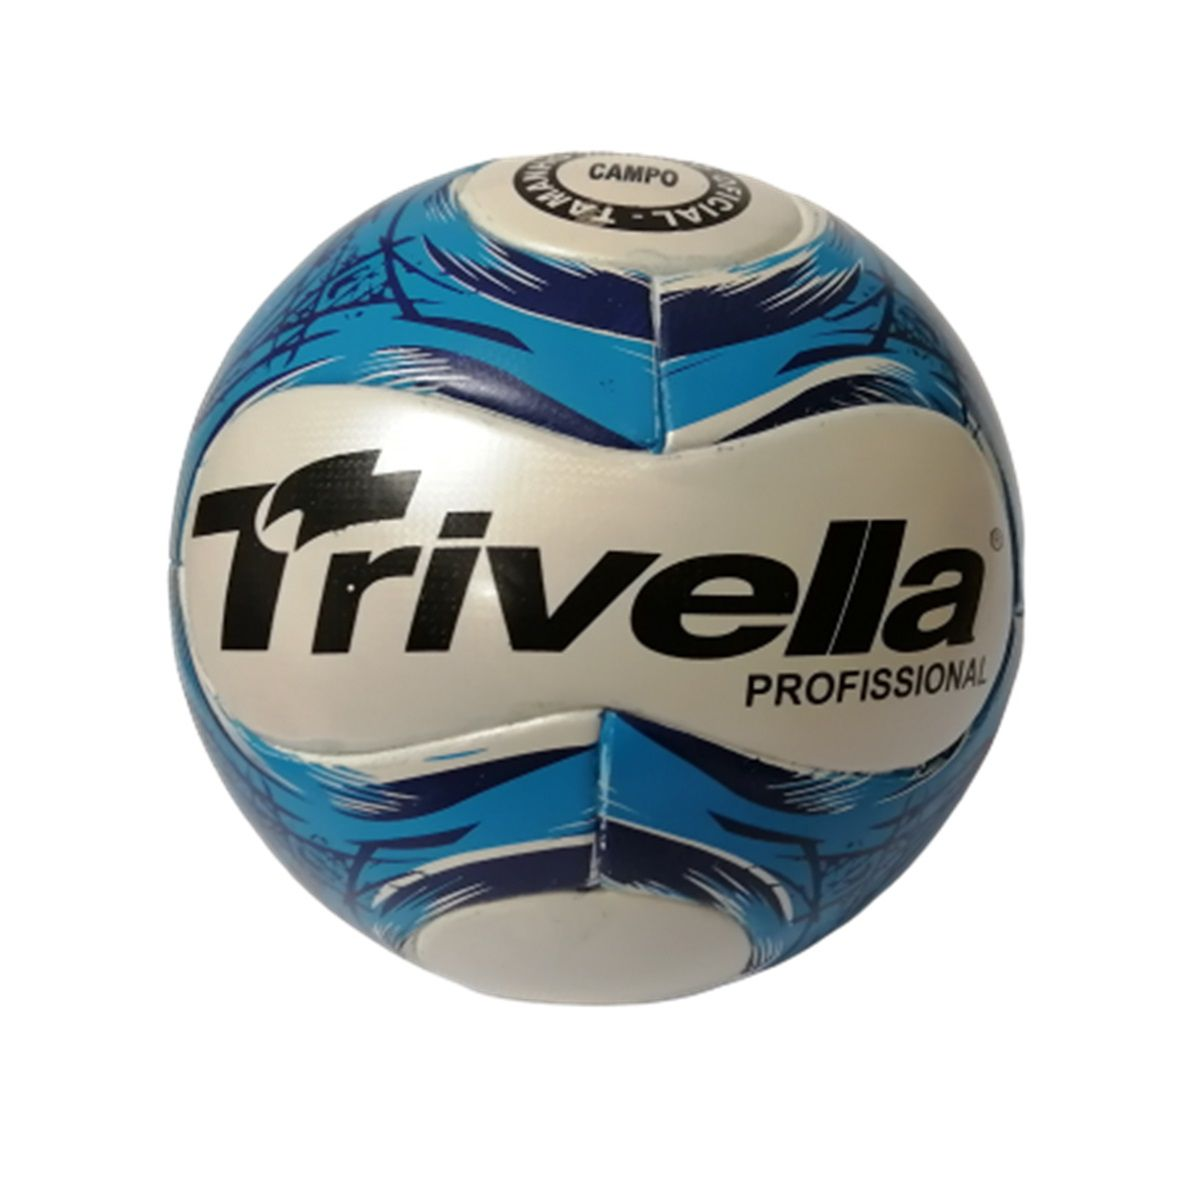 Bola Futebol de Campo Trivella 100% PU Profissional